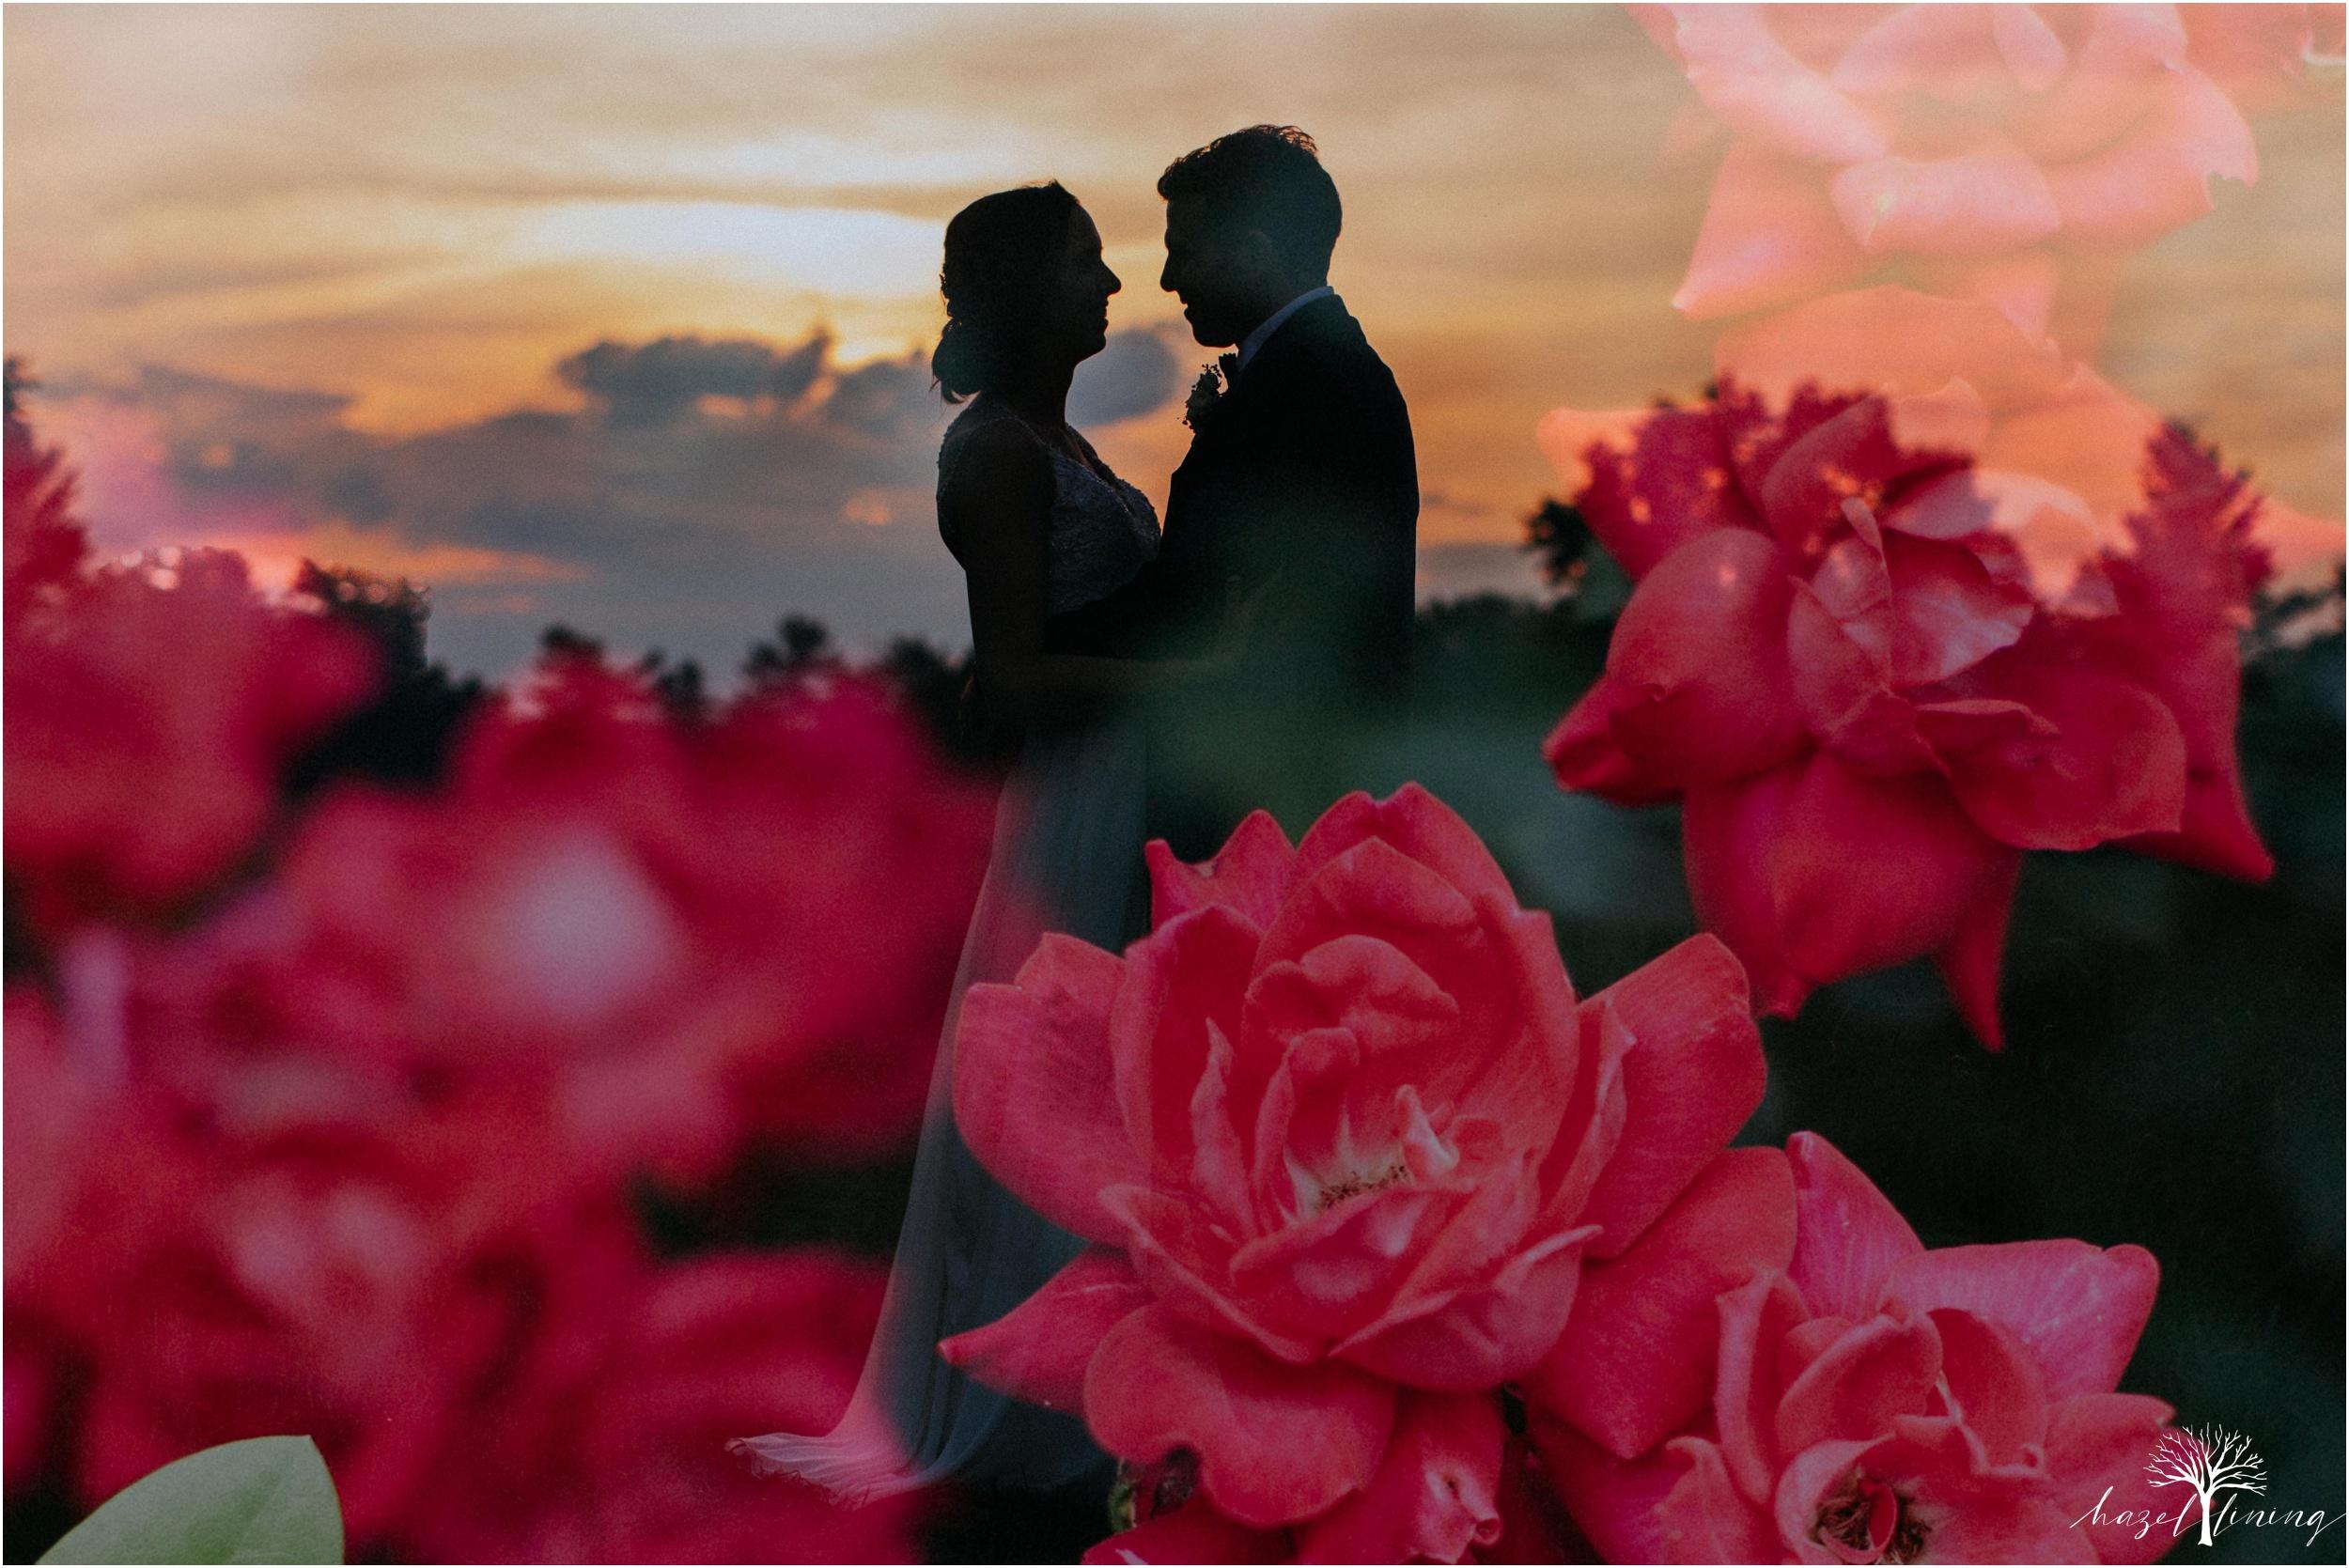 hazel-lining-travel-wedding-elopement-photography_0180.jpg